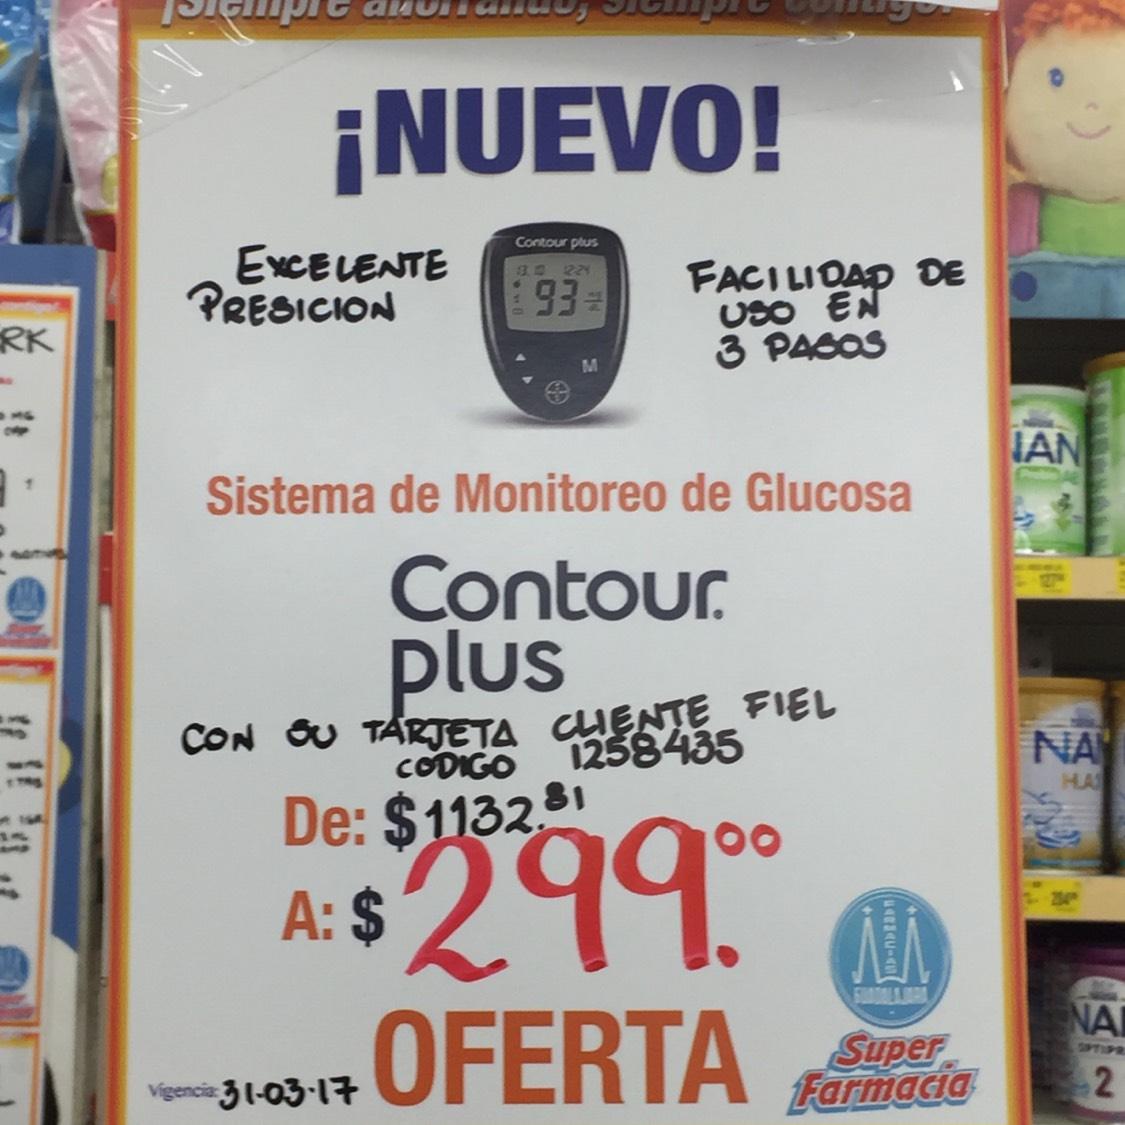 Farmacias Guadalajara: Contour plus medidor glucosa